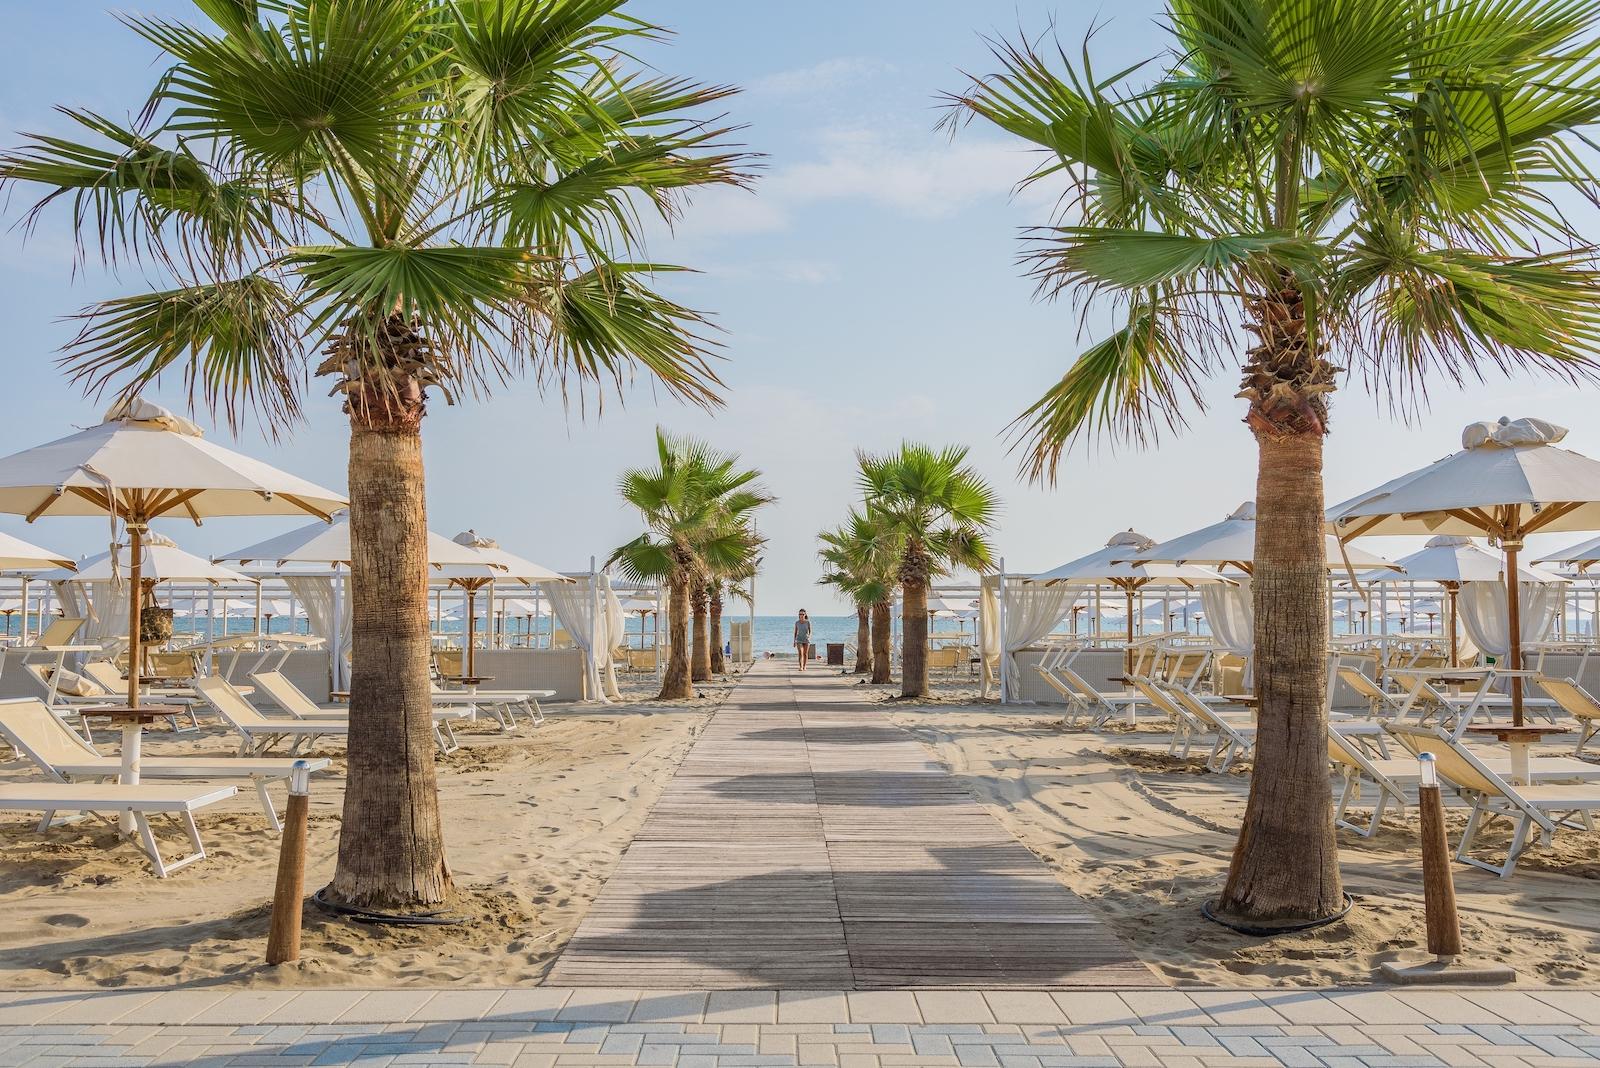 Spiaggia_LePALME_0047